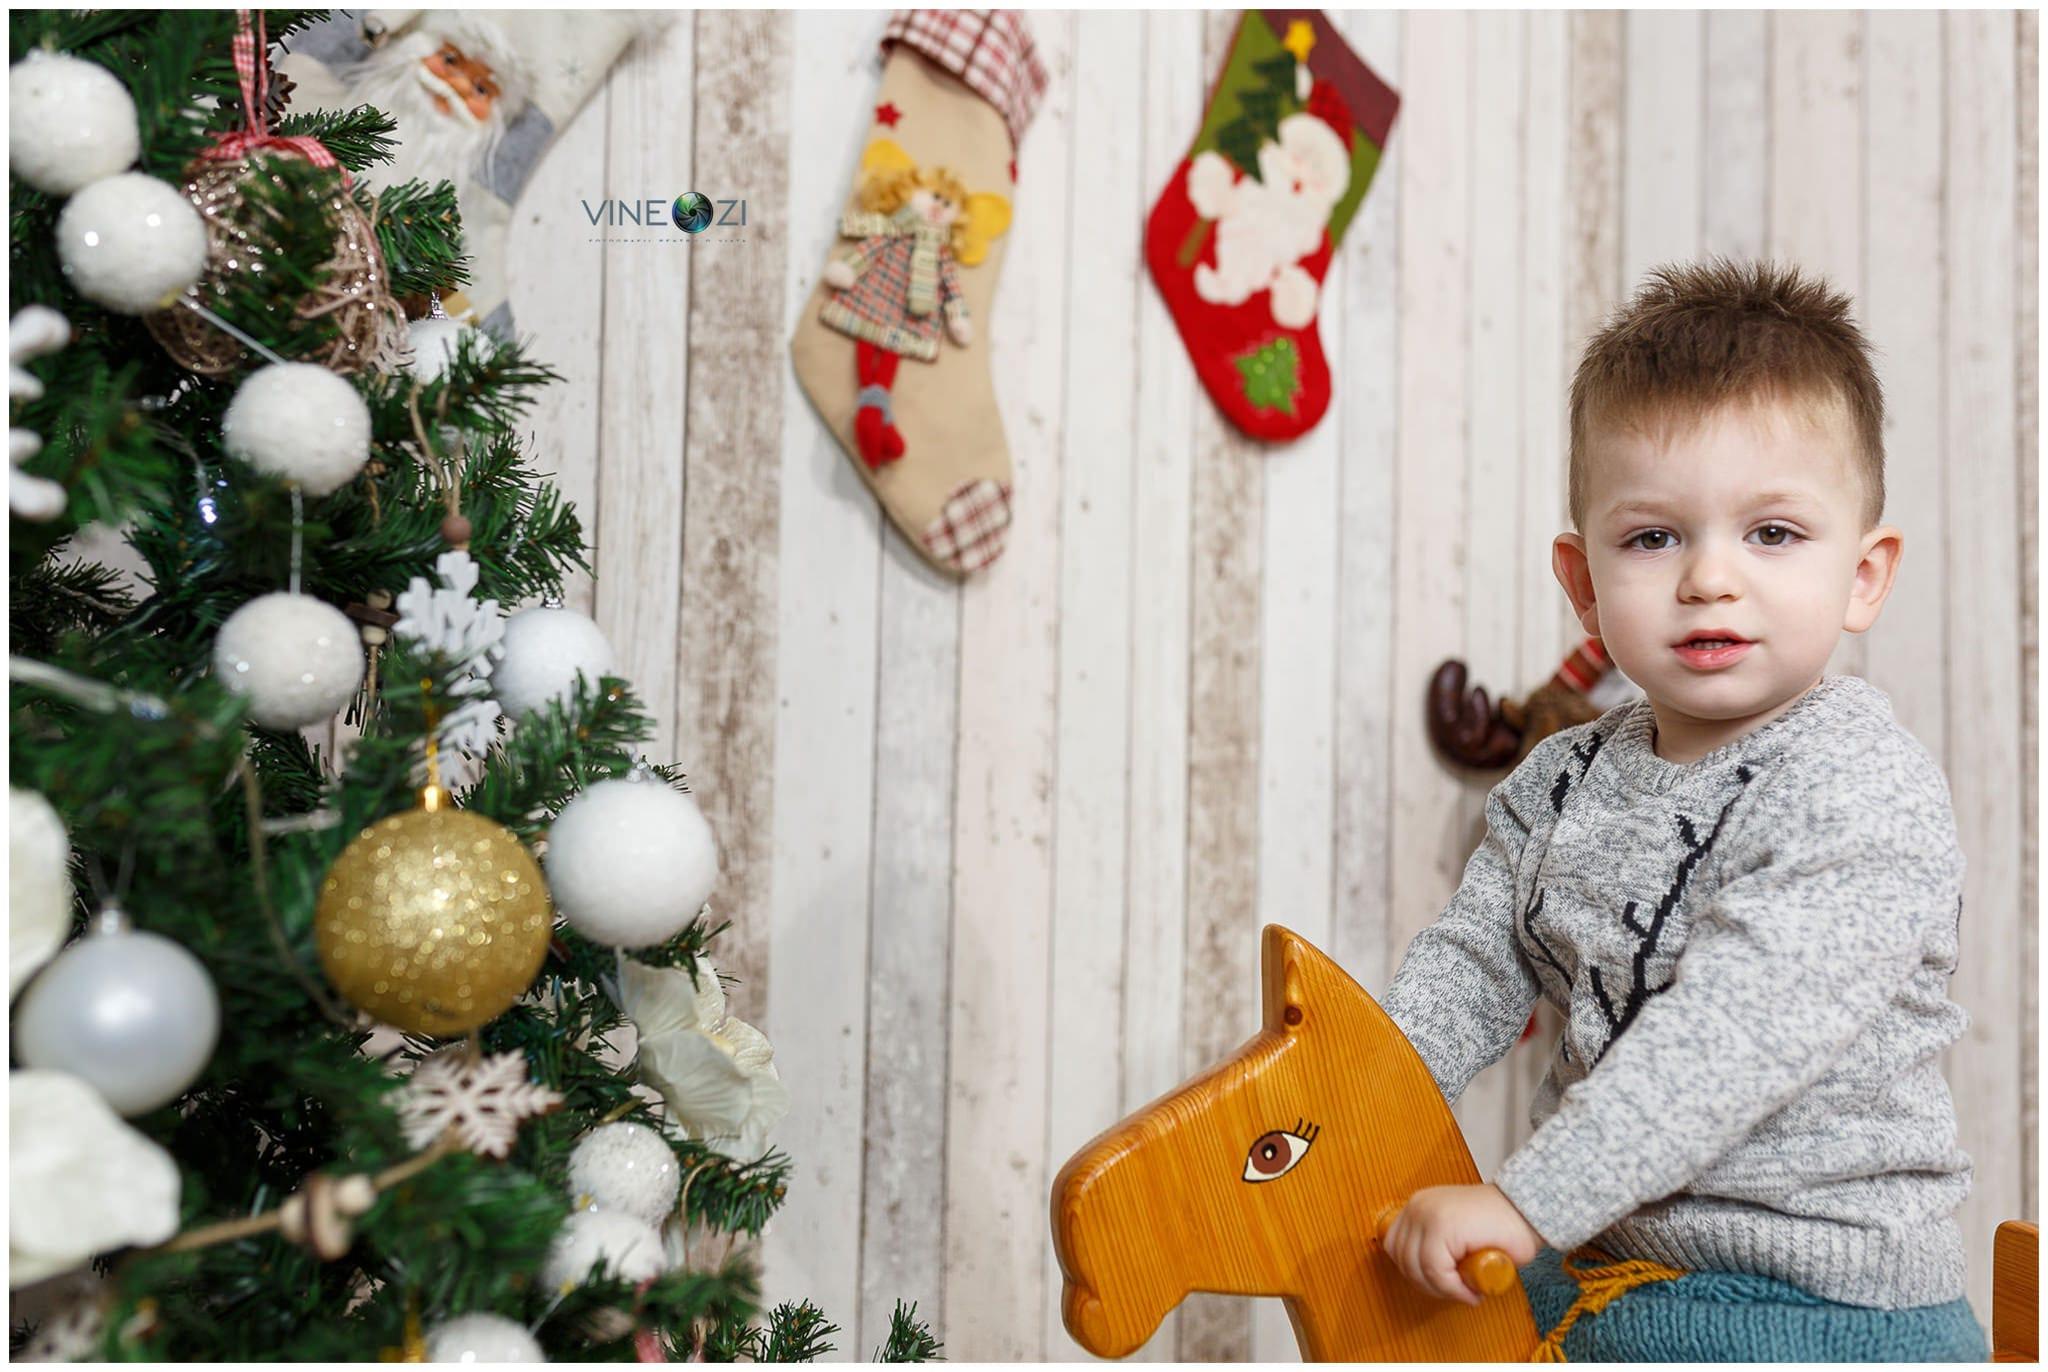 Iosif-Sedinta-Foto-Craciun-2017-@-Falticeni-©-Codrin-Anton-FOTOGRAF-–-www.VineOZi.ro.jpg